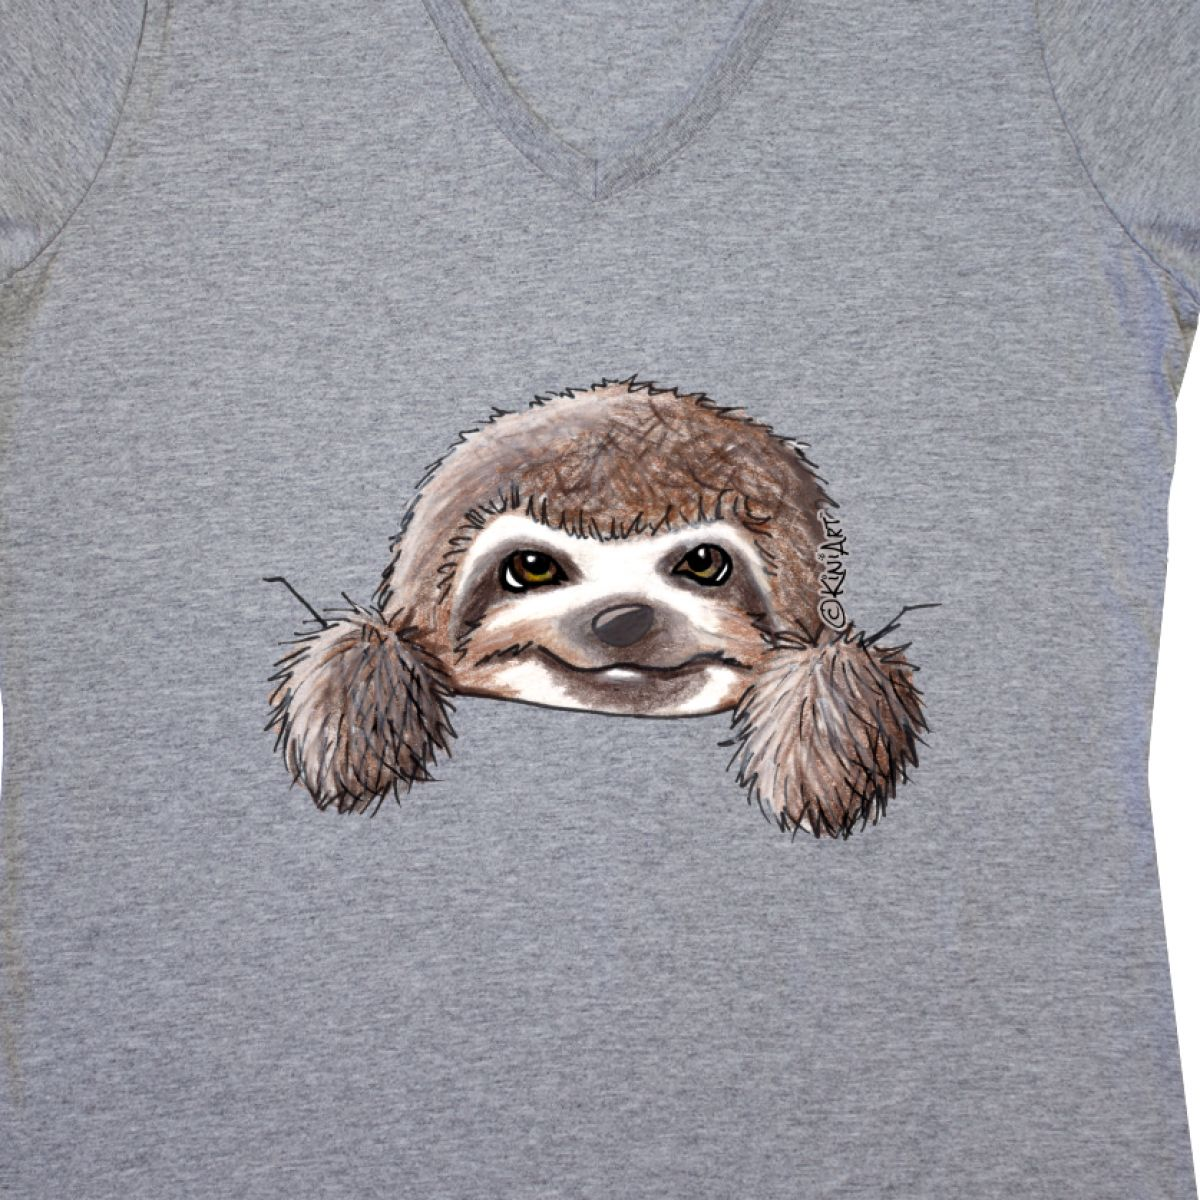 760f1f97080 Inktastic KiniArt Sloth Women s V-Neck T-Shirt - KiniArt Cute ...